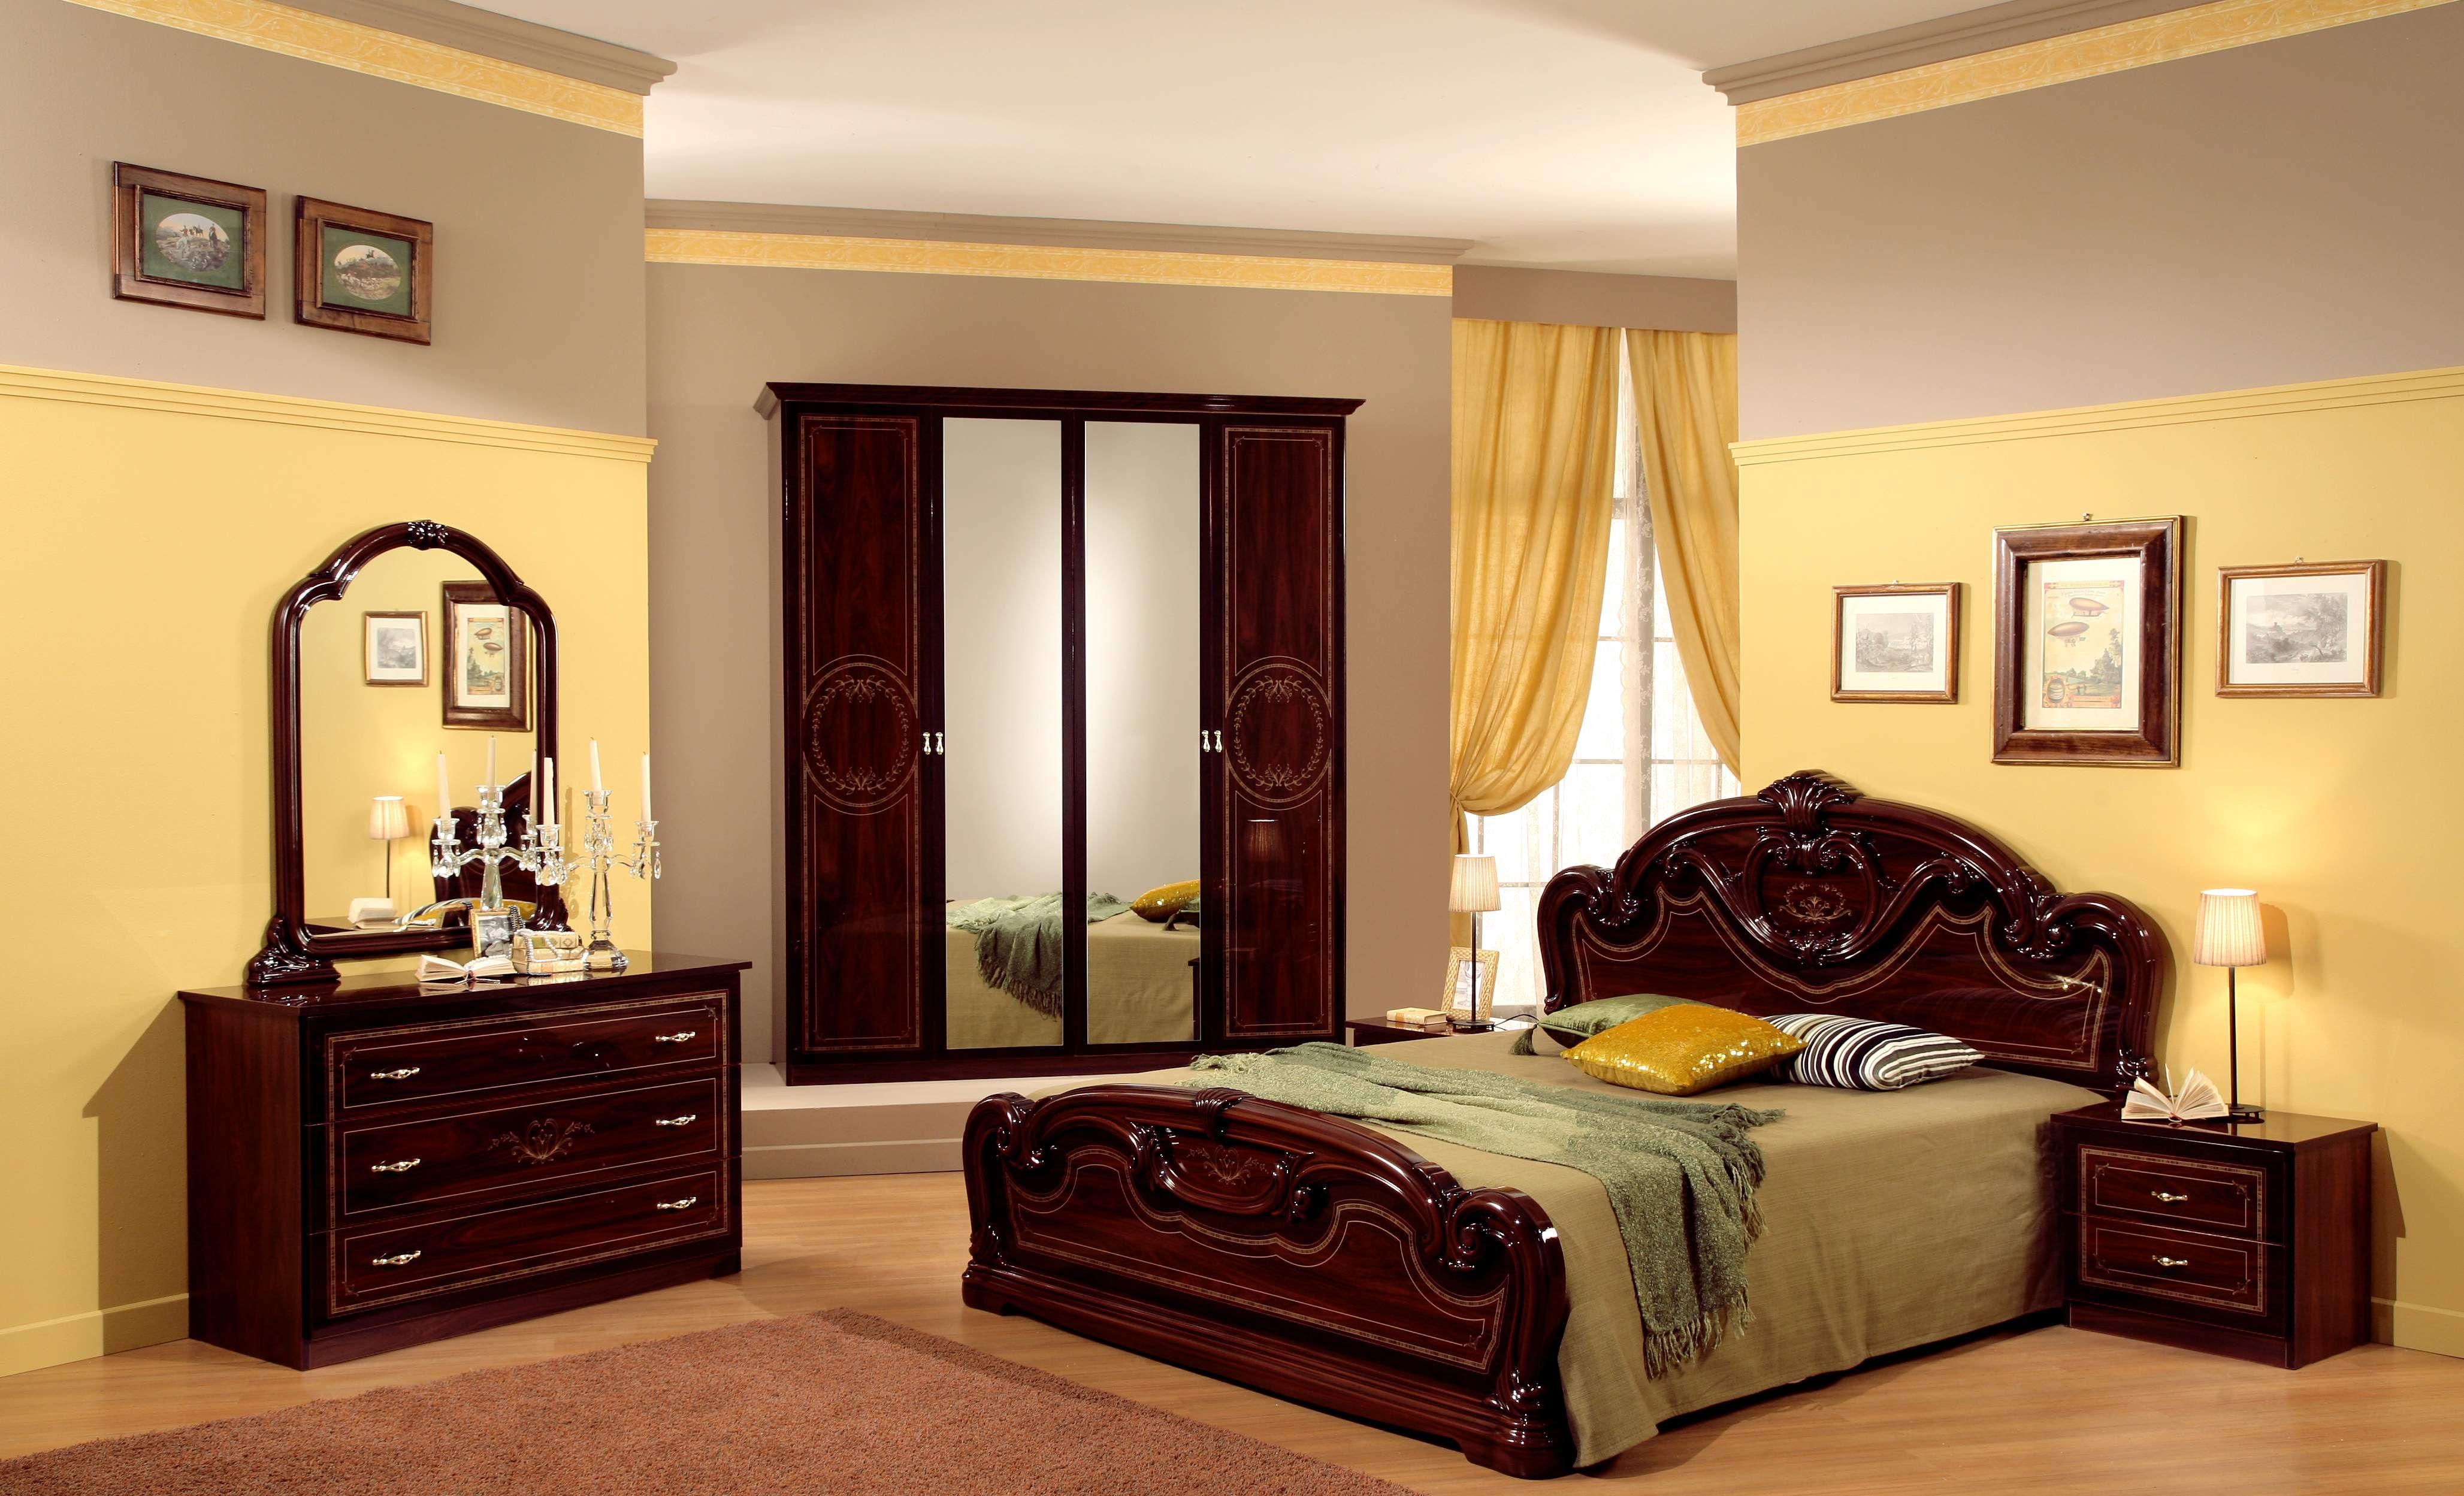 Classic Bedroom Design Decor Furniture Ideas Cream Yellow Color Scheeme Bed Design Modern Bed Design Bedroom Sets